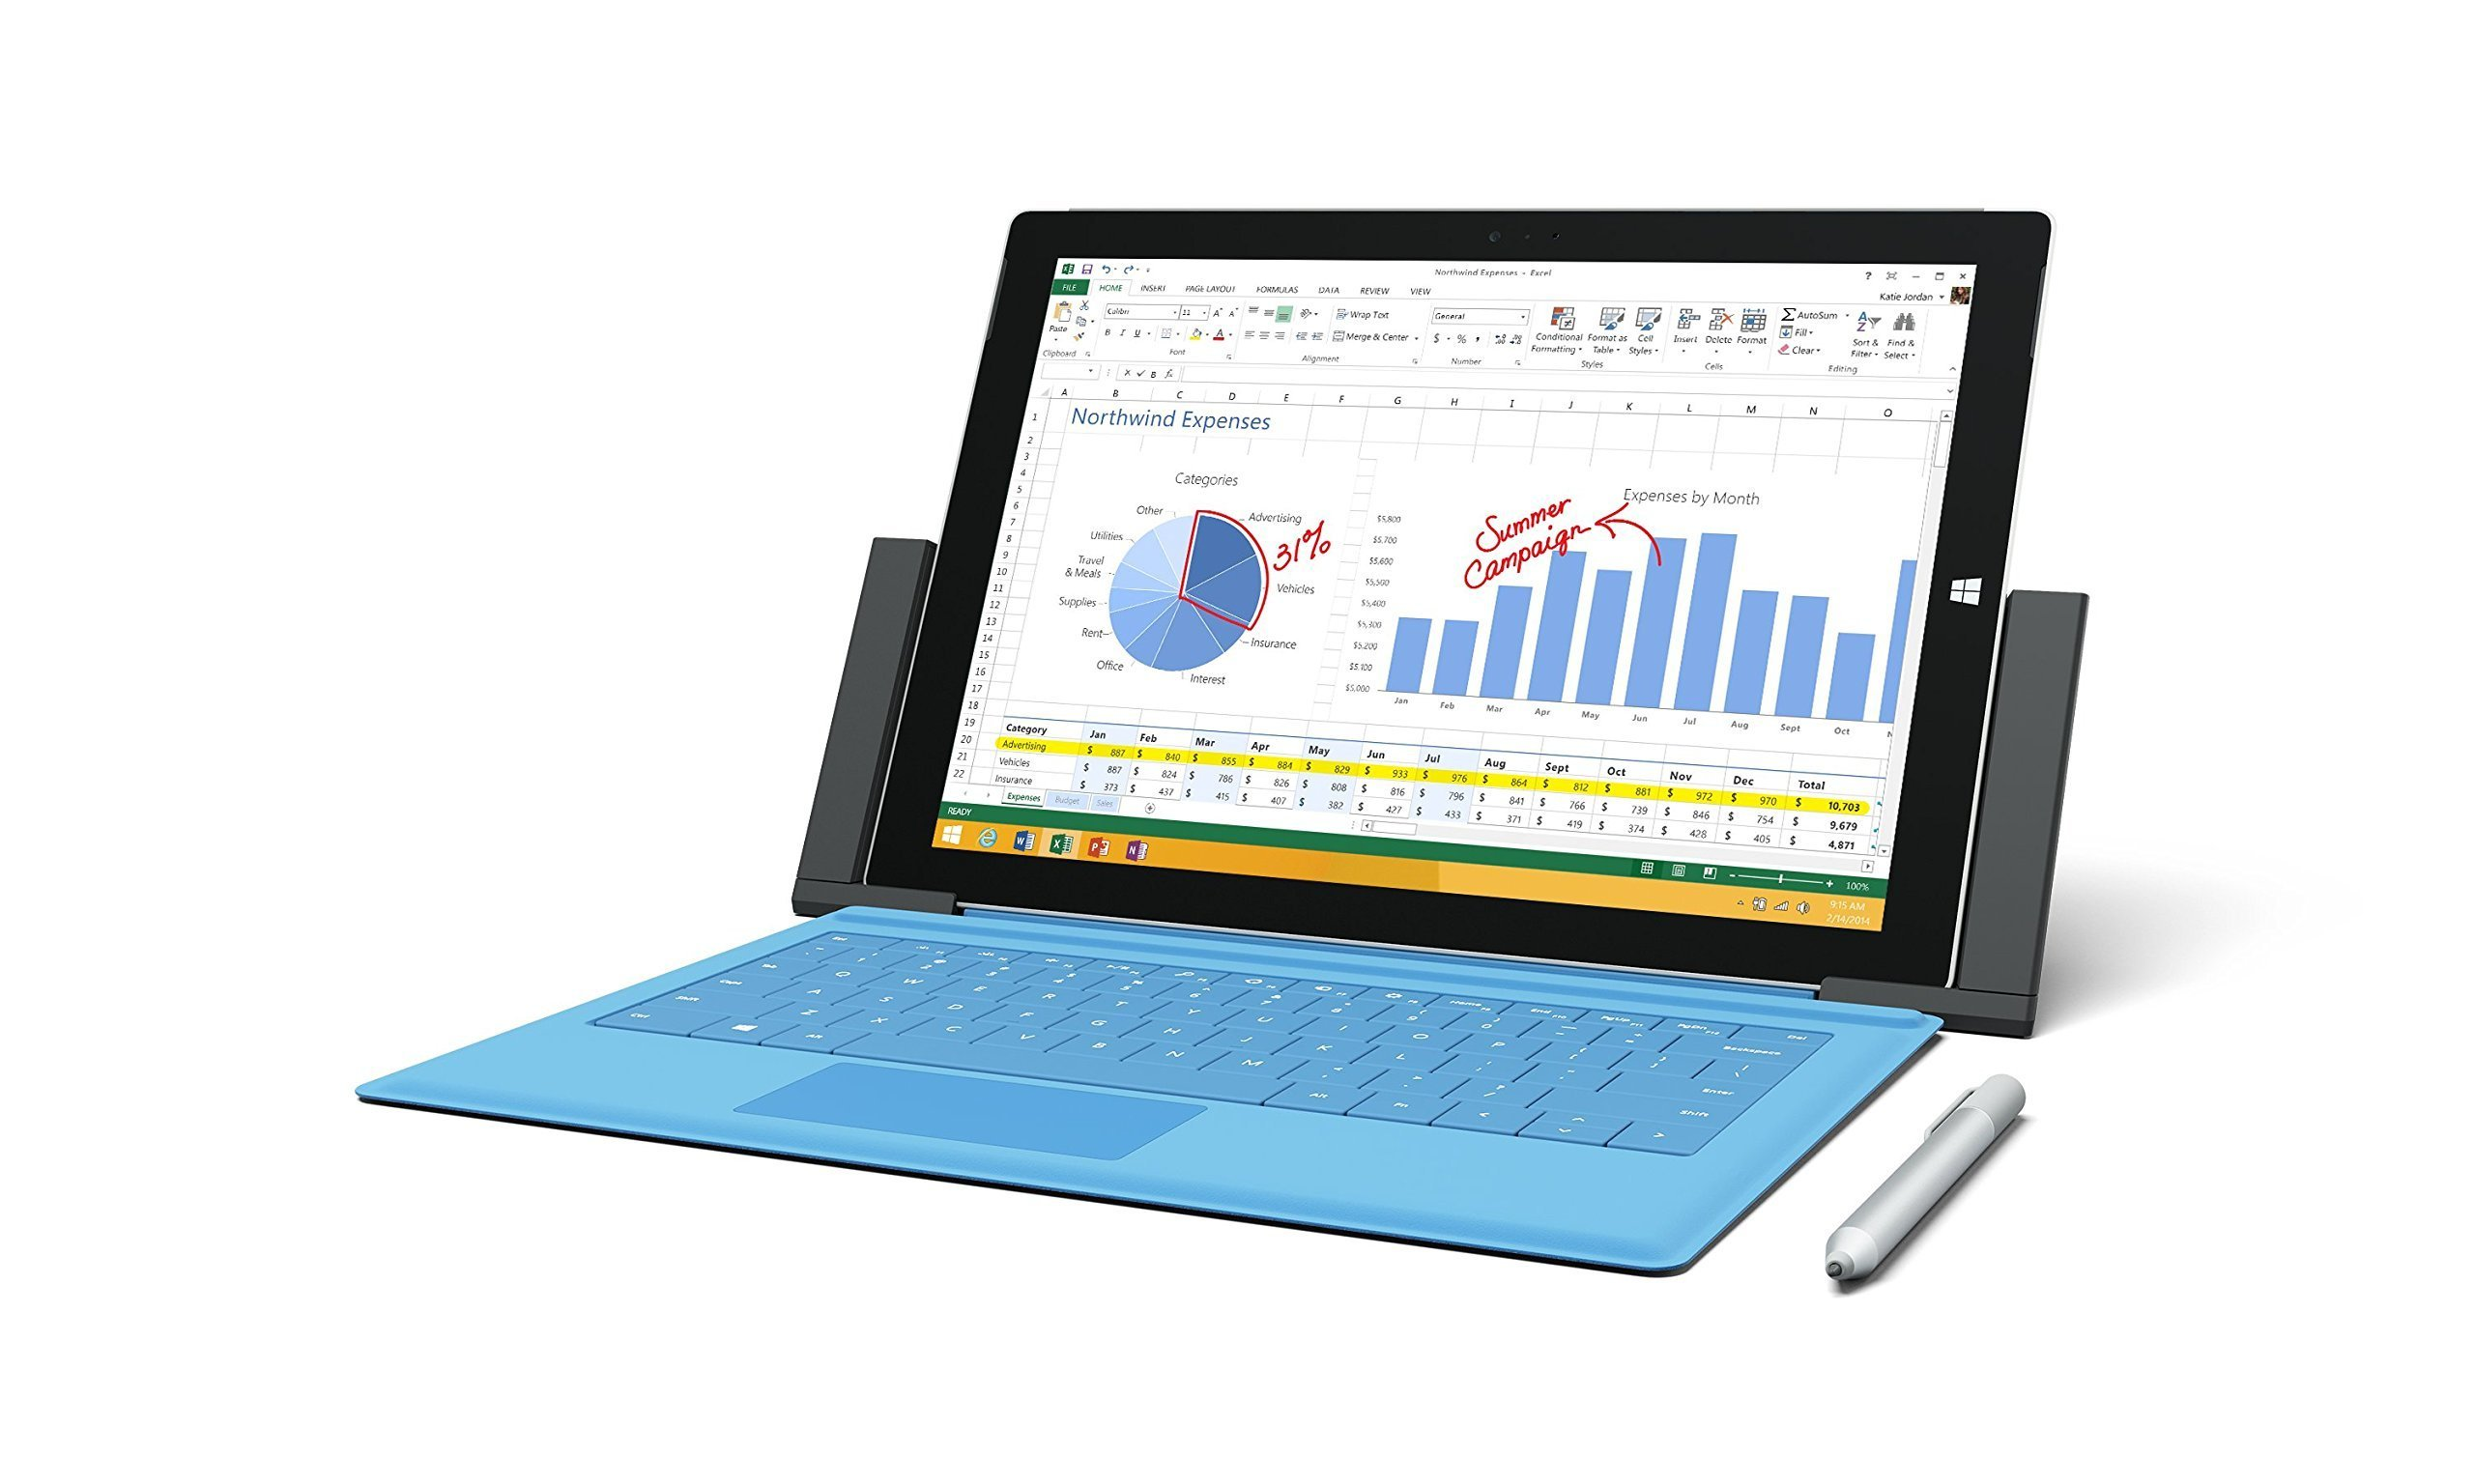 Microsoft Docking Station for Surface Pro 3 3Q9-00001 (Renewed) by Microsoft (Image #4)